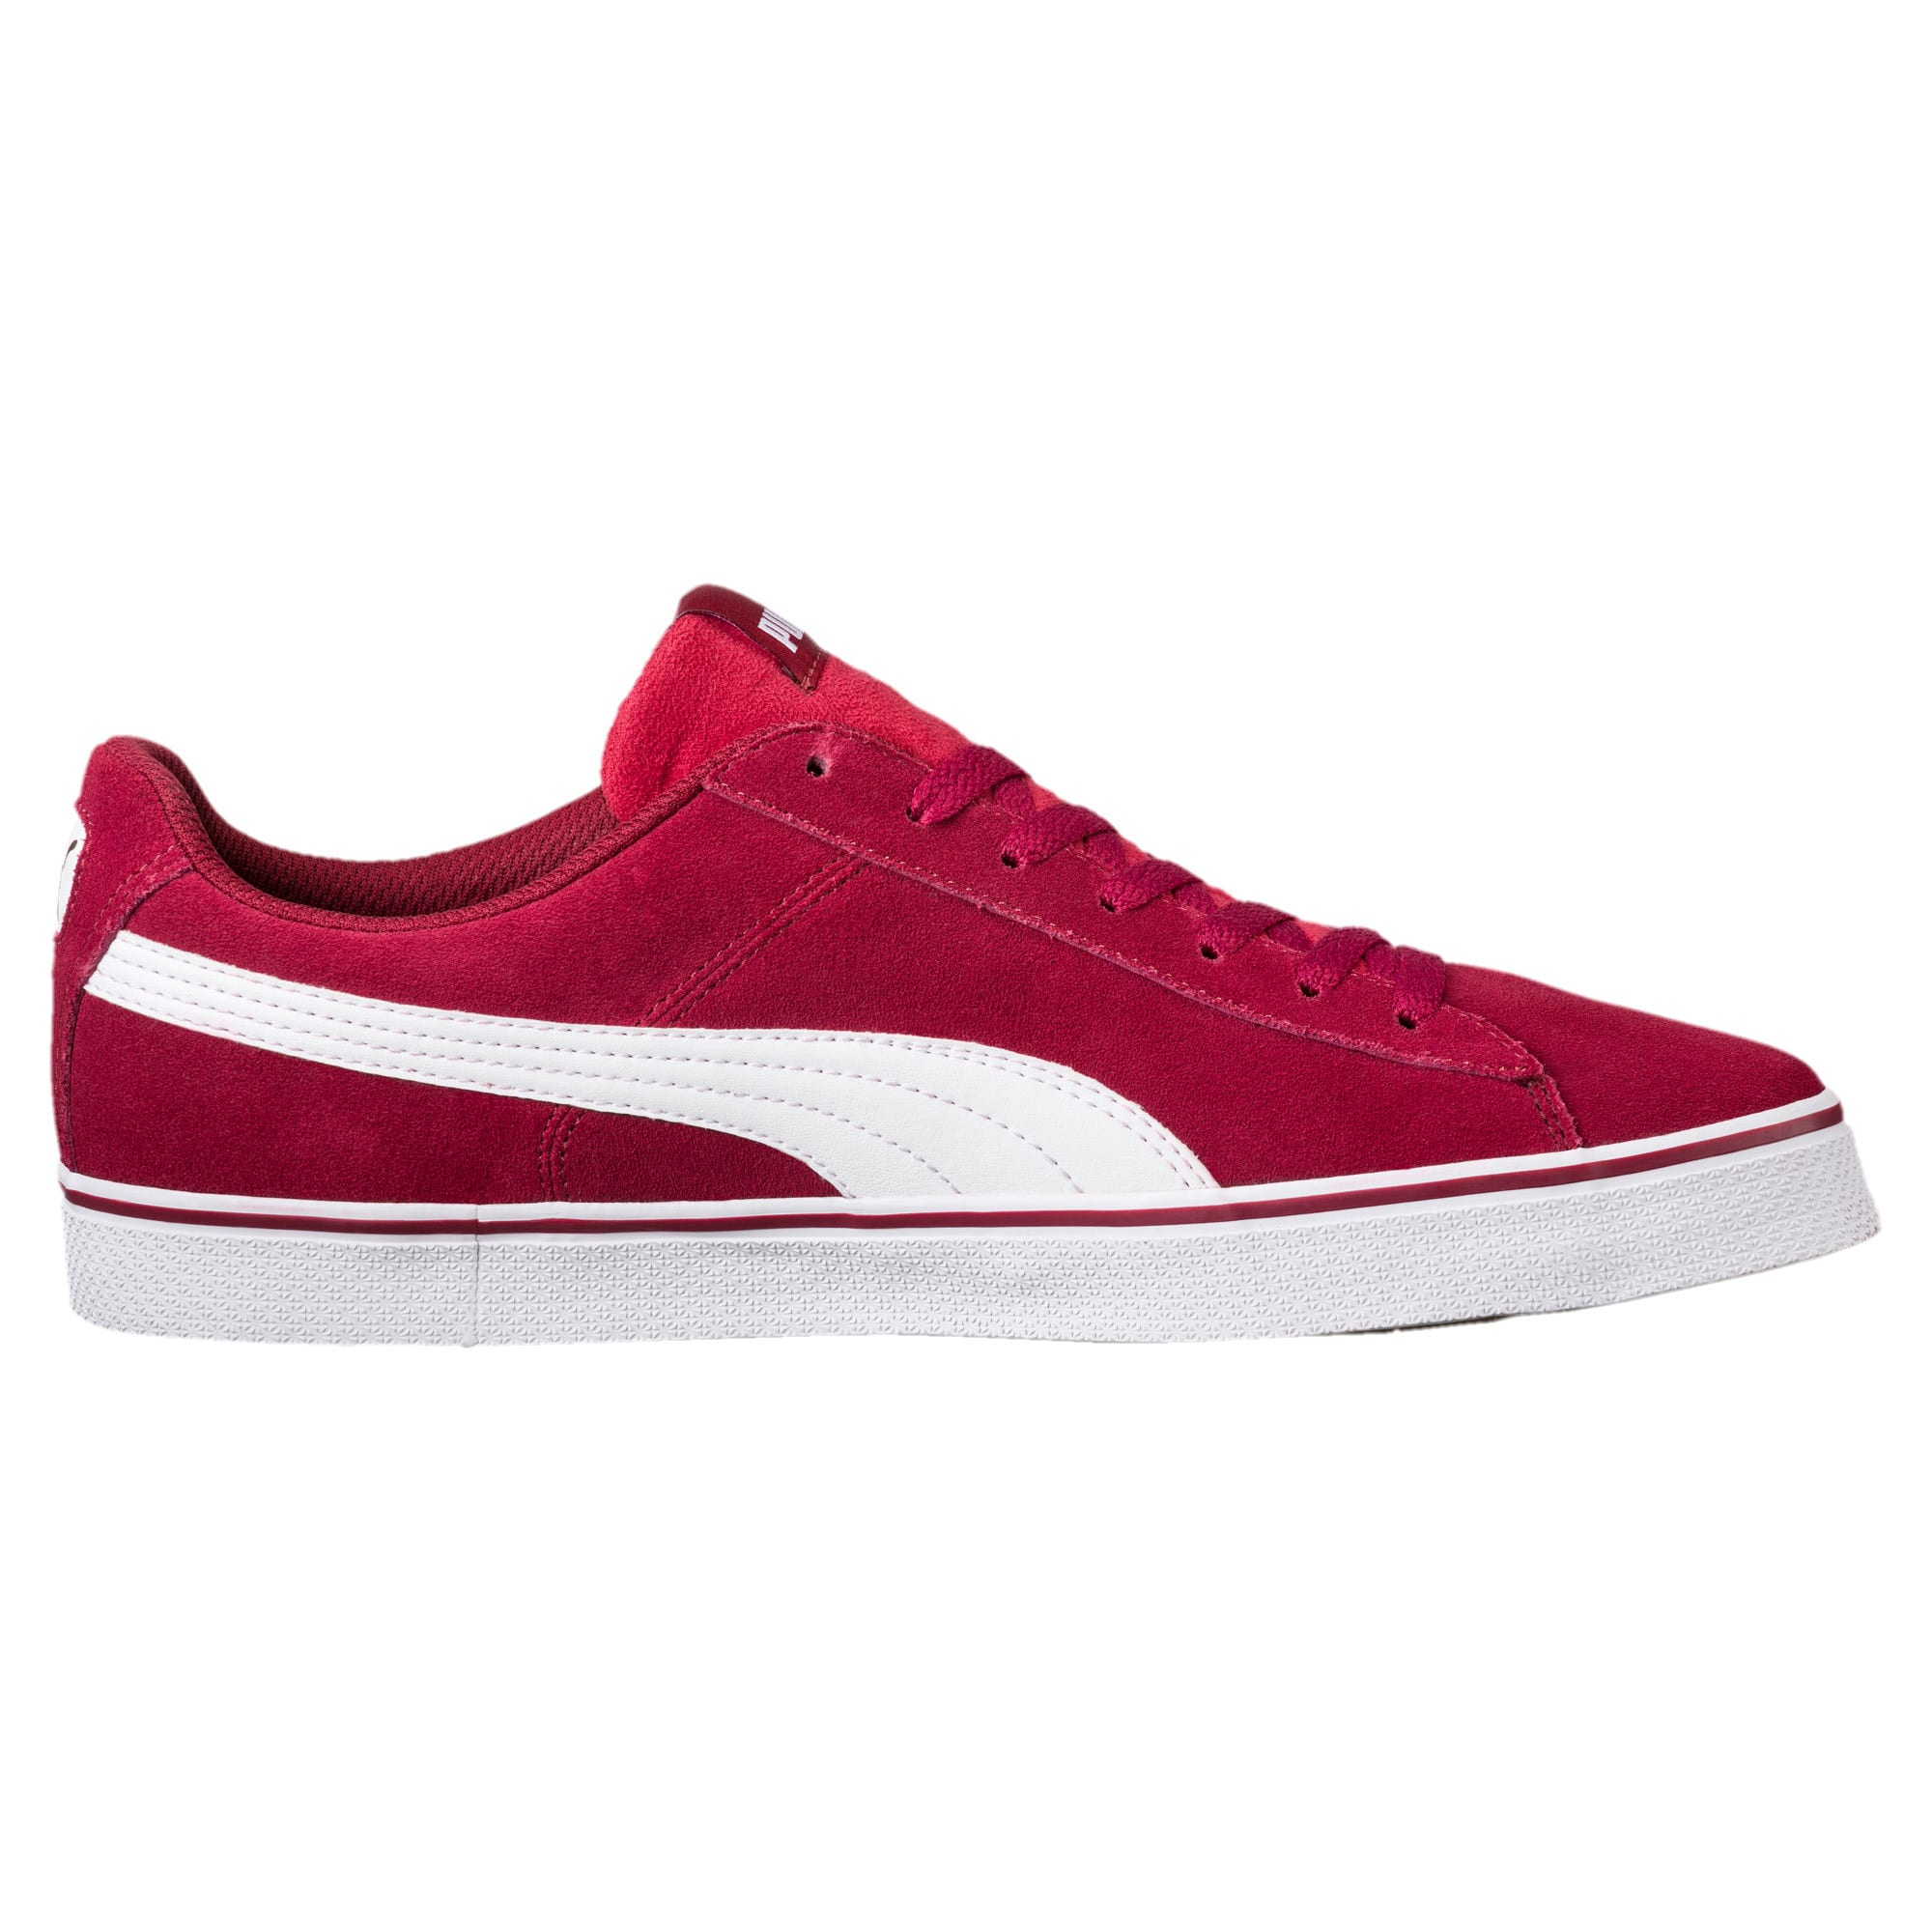 Thumbnail 3 of PUMA 1948 Vulc Men's Sneakers, Tibetan Red-Puma White, medium